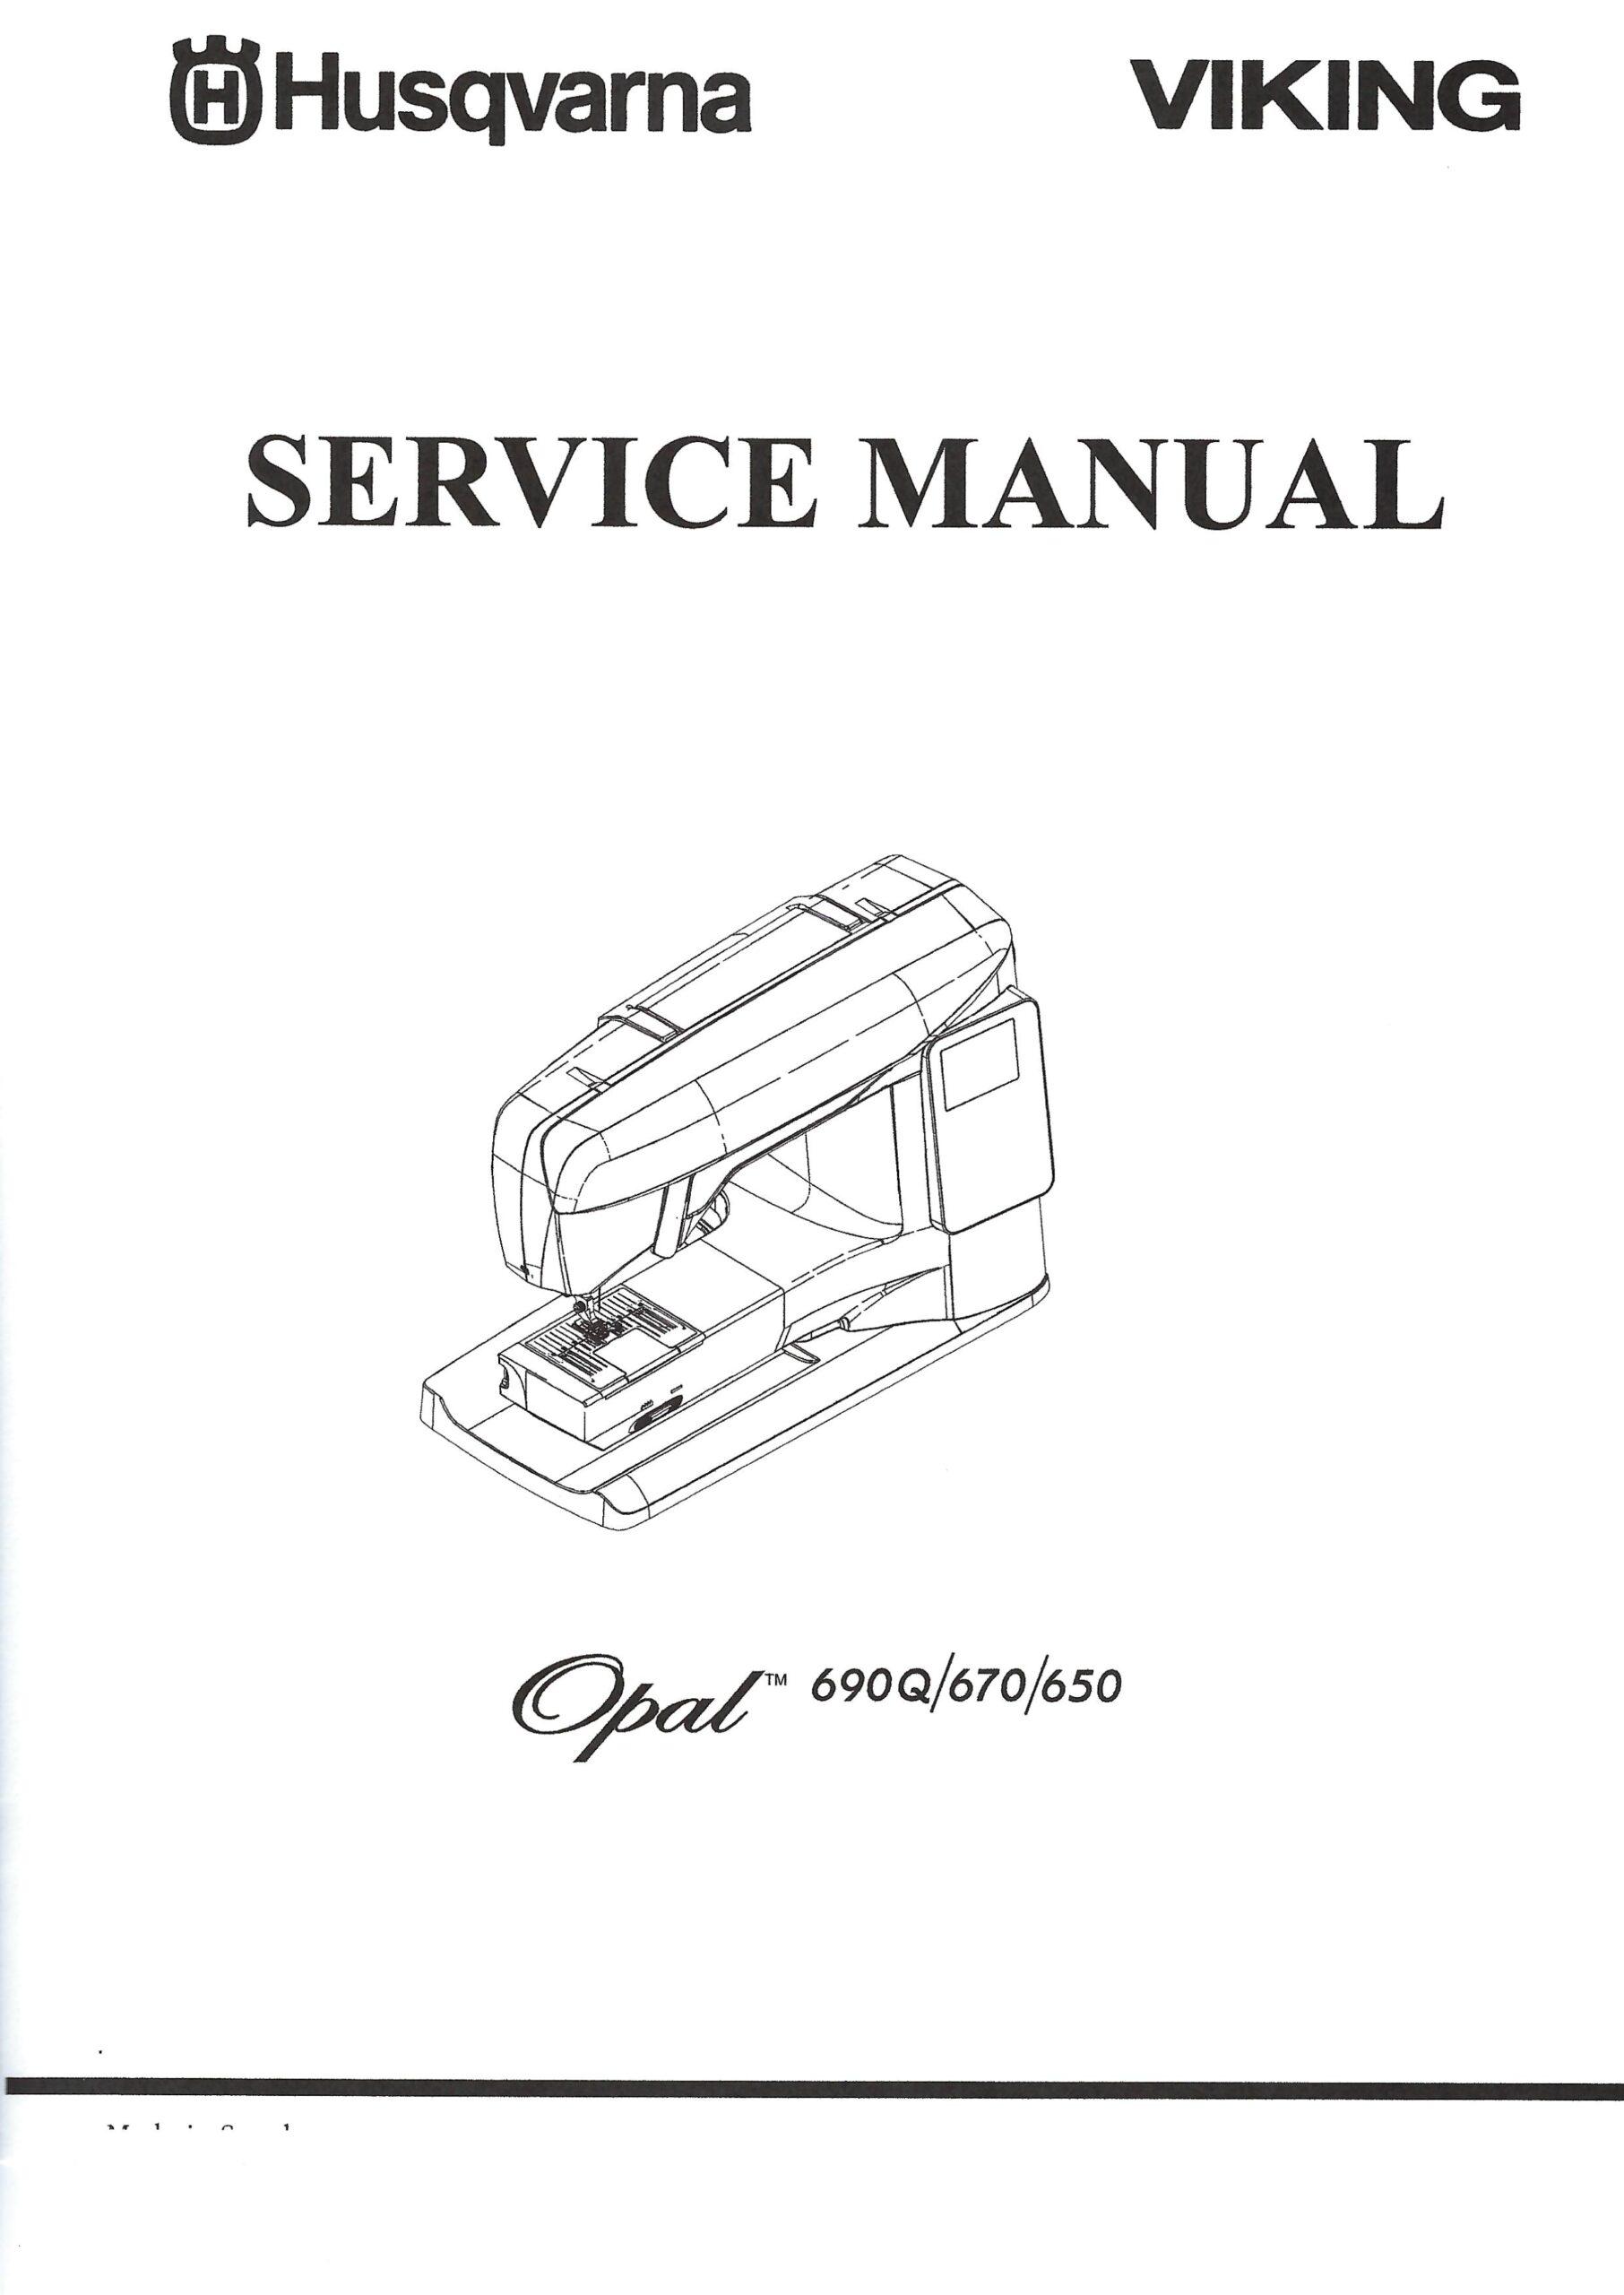 Service Manual Viking Opal 650, 670, 690Q Sewing Machine